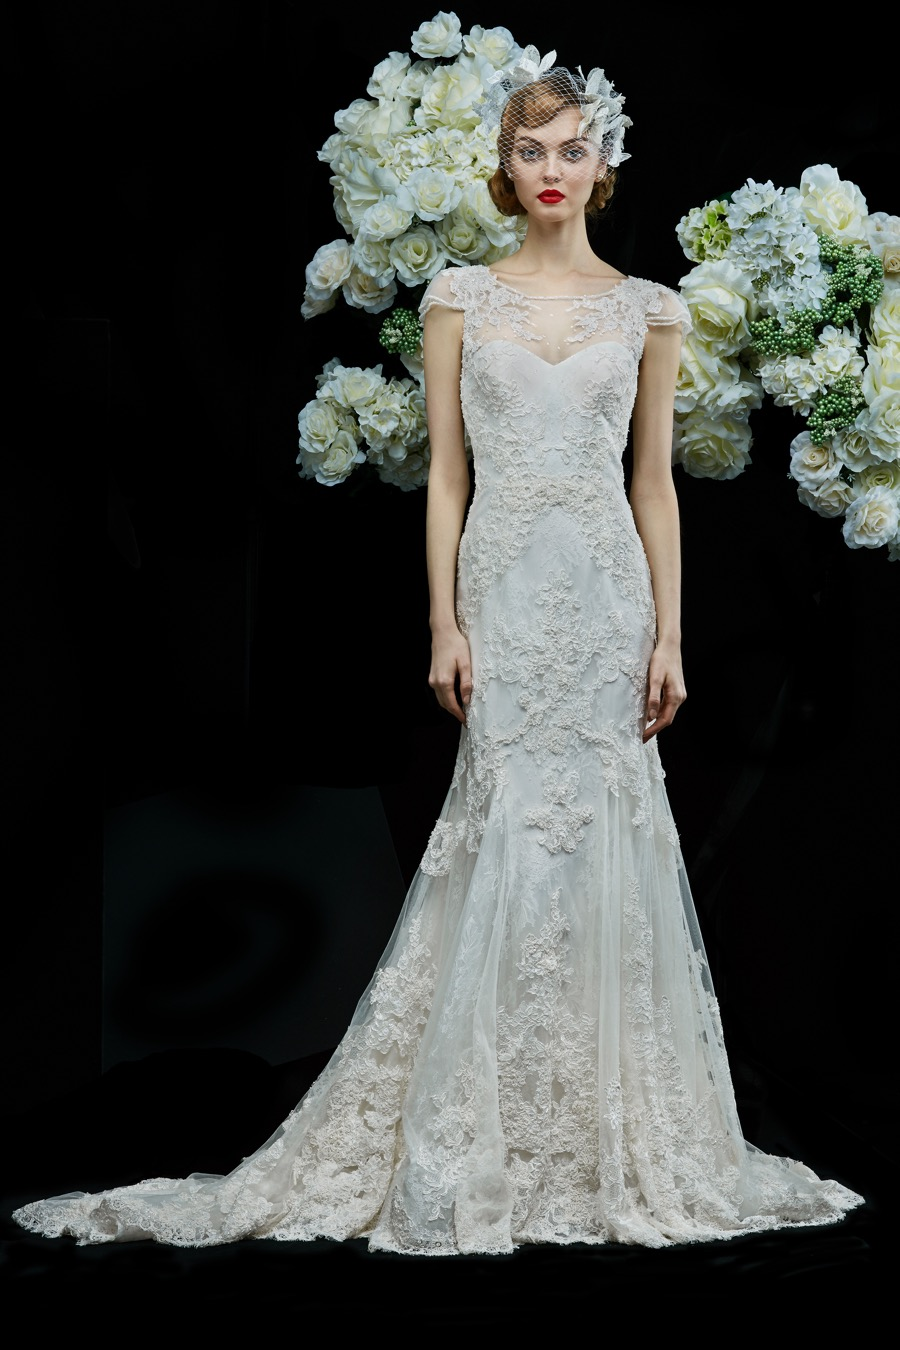 Annasul Y €� Moonstone: Y Vintage Mermaid Wedding Dress At Websimilar.org